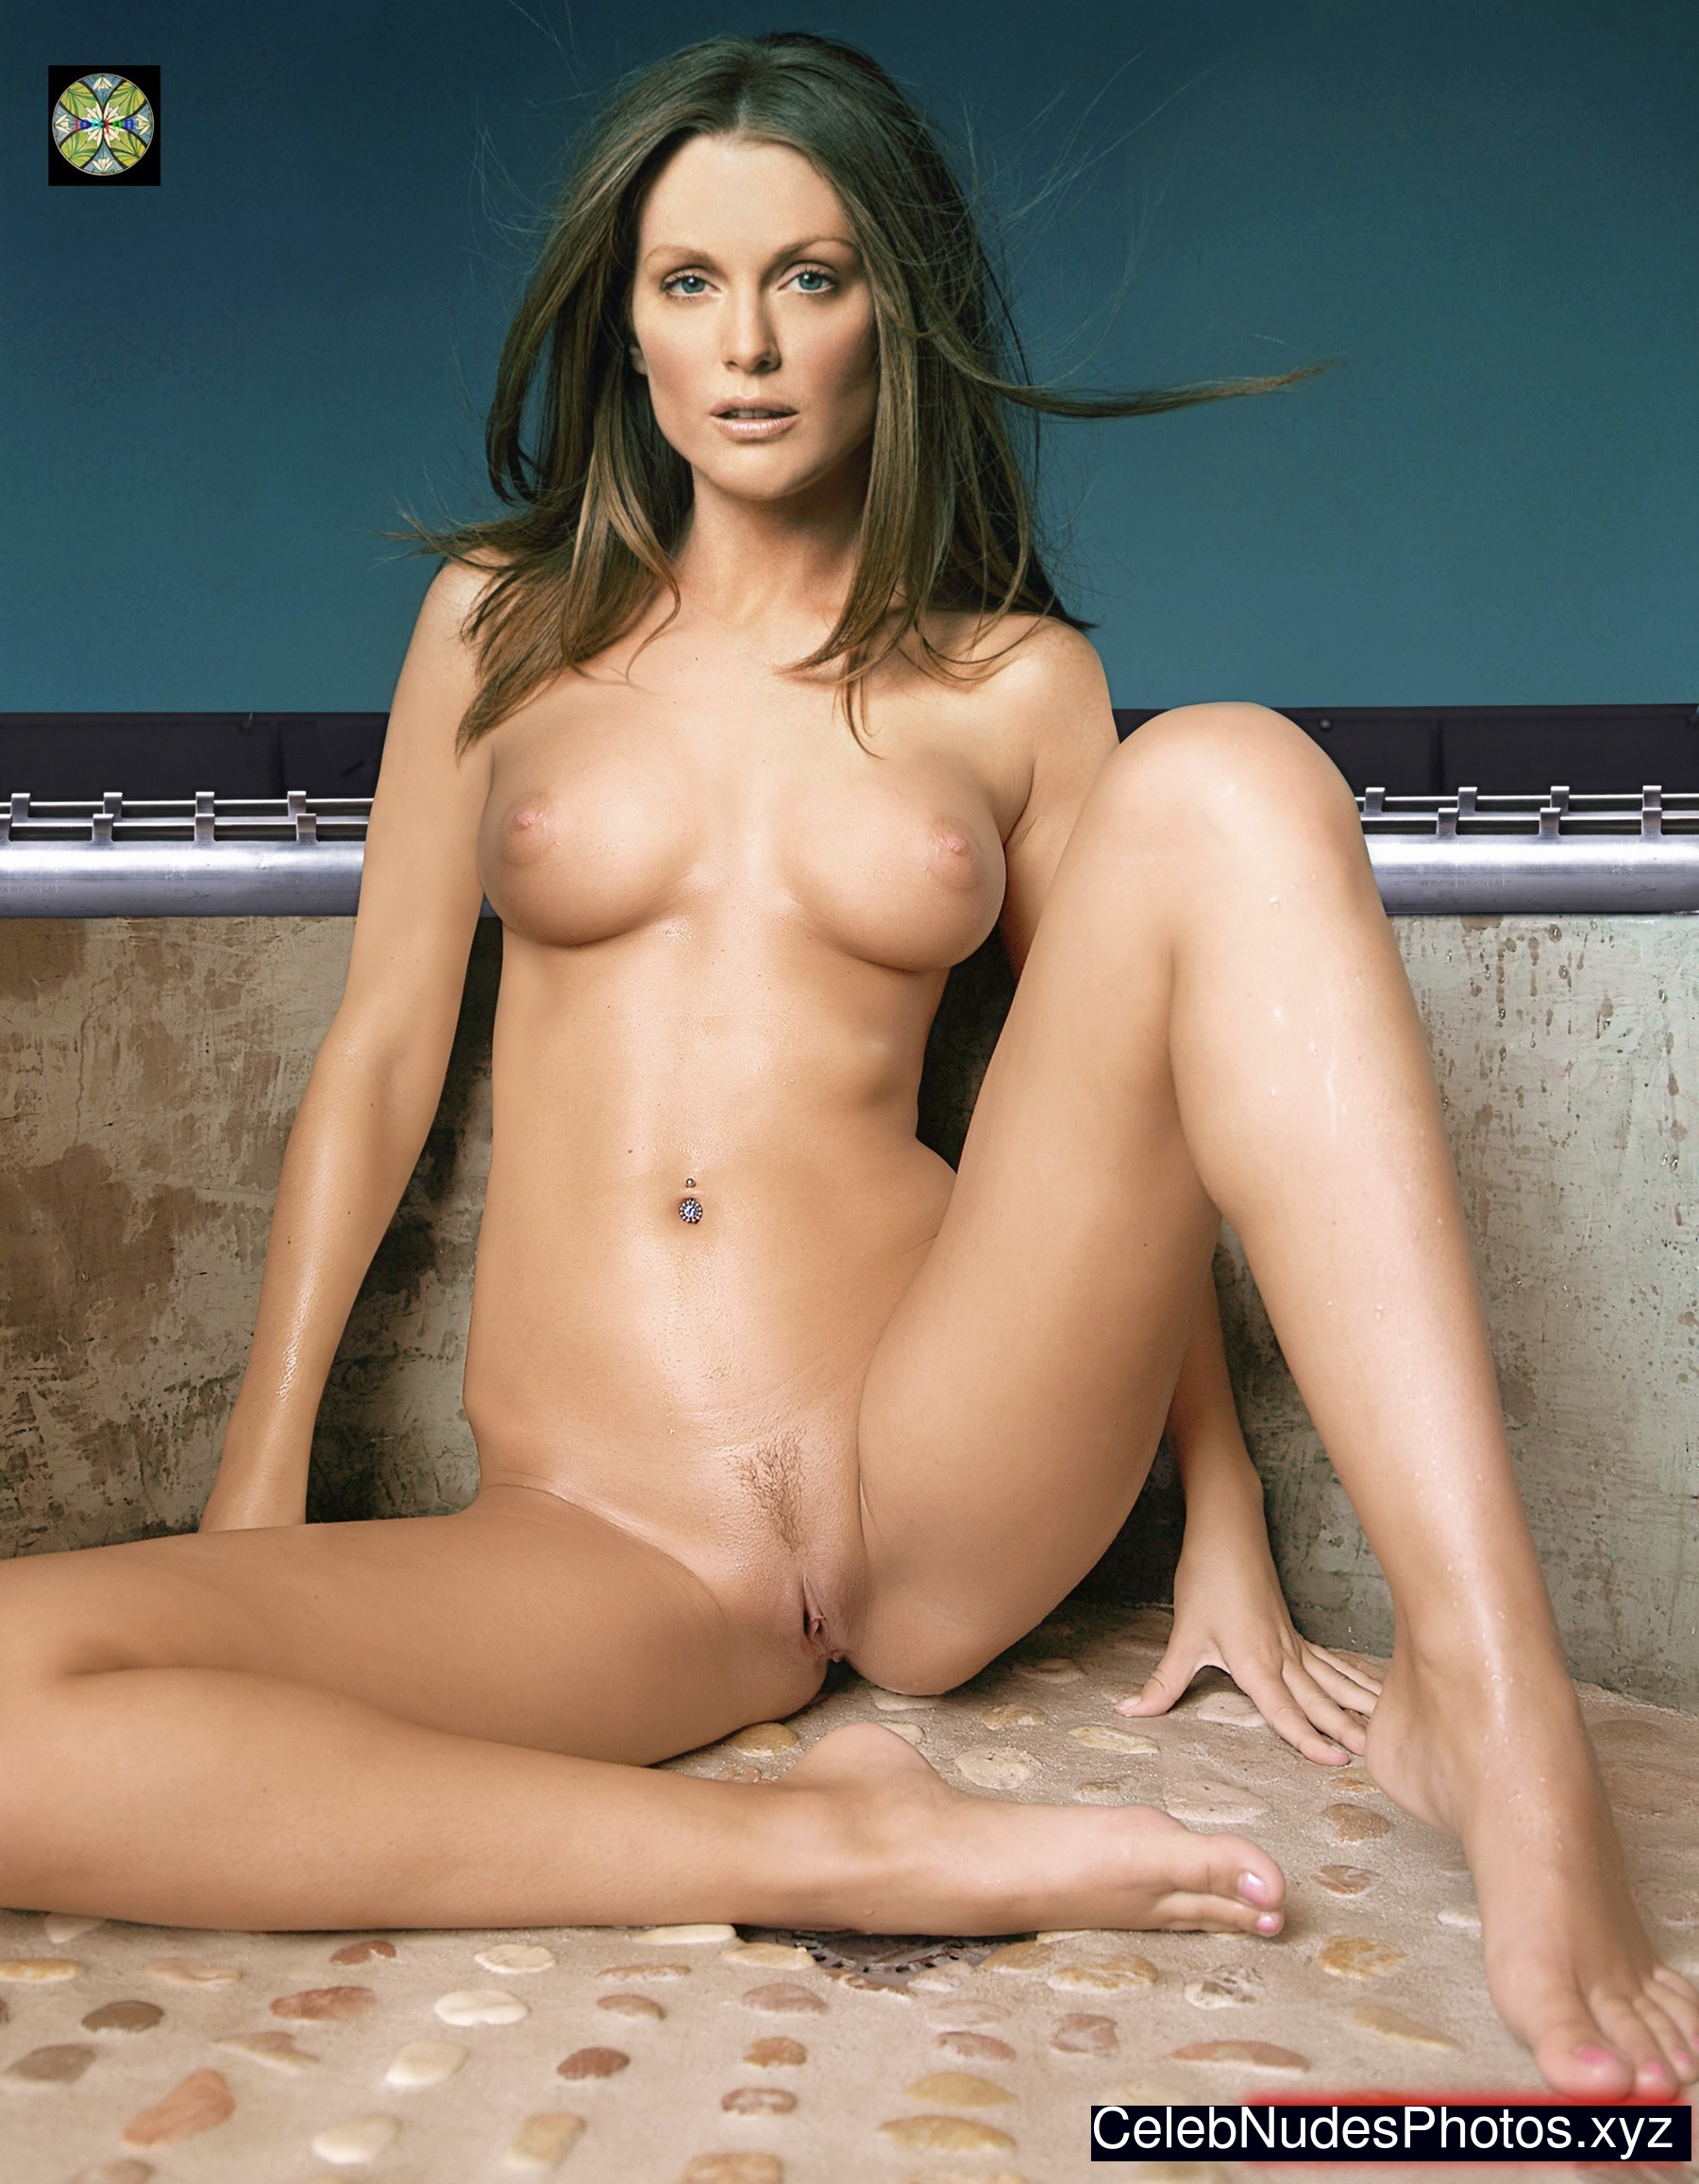 julianne moore naked fakes